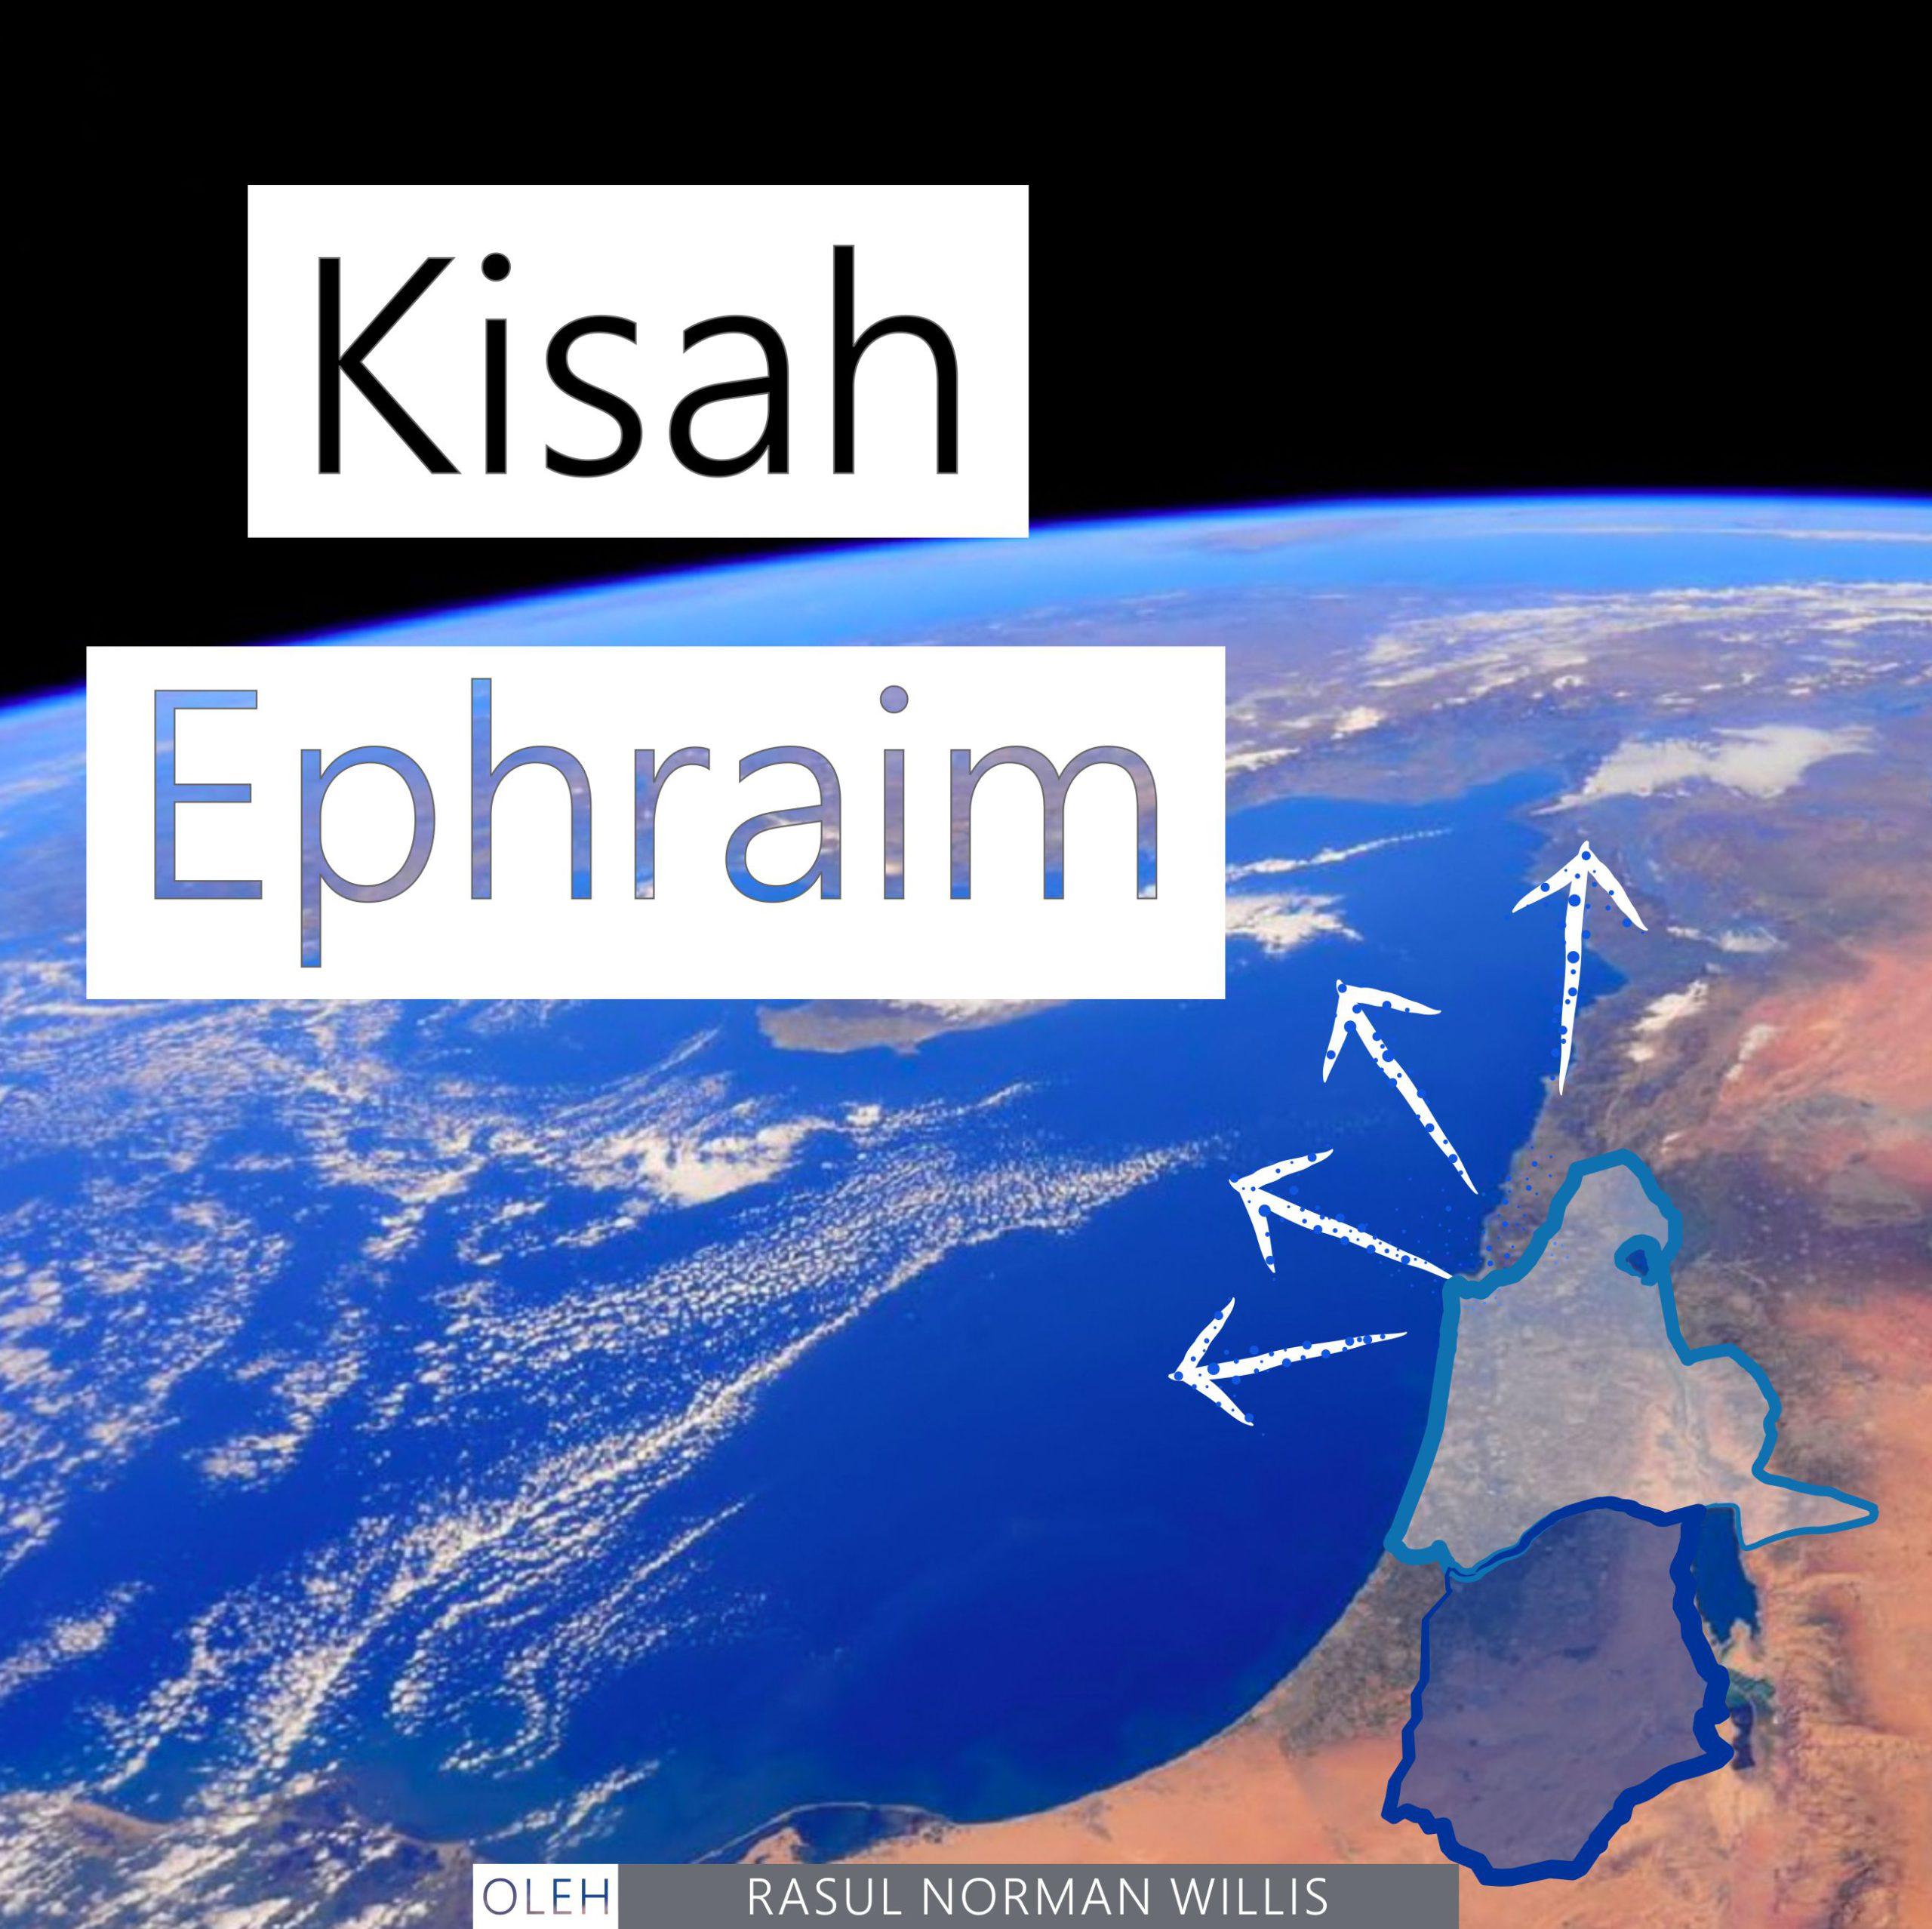 Kisah Ephraim (Sedang berlangsung)